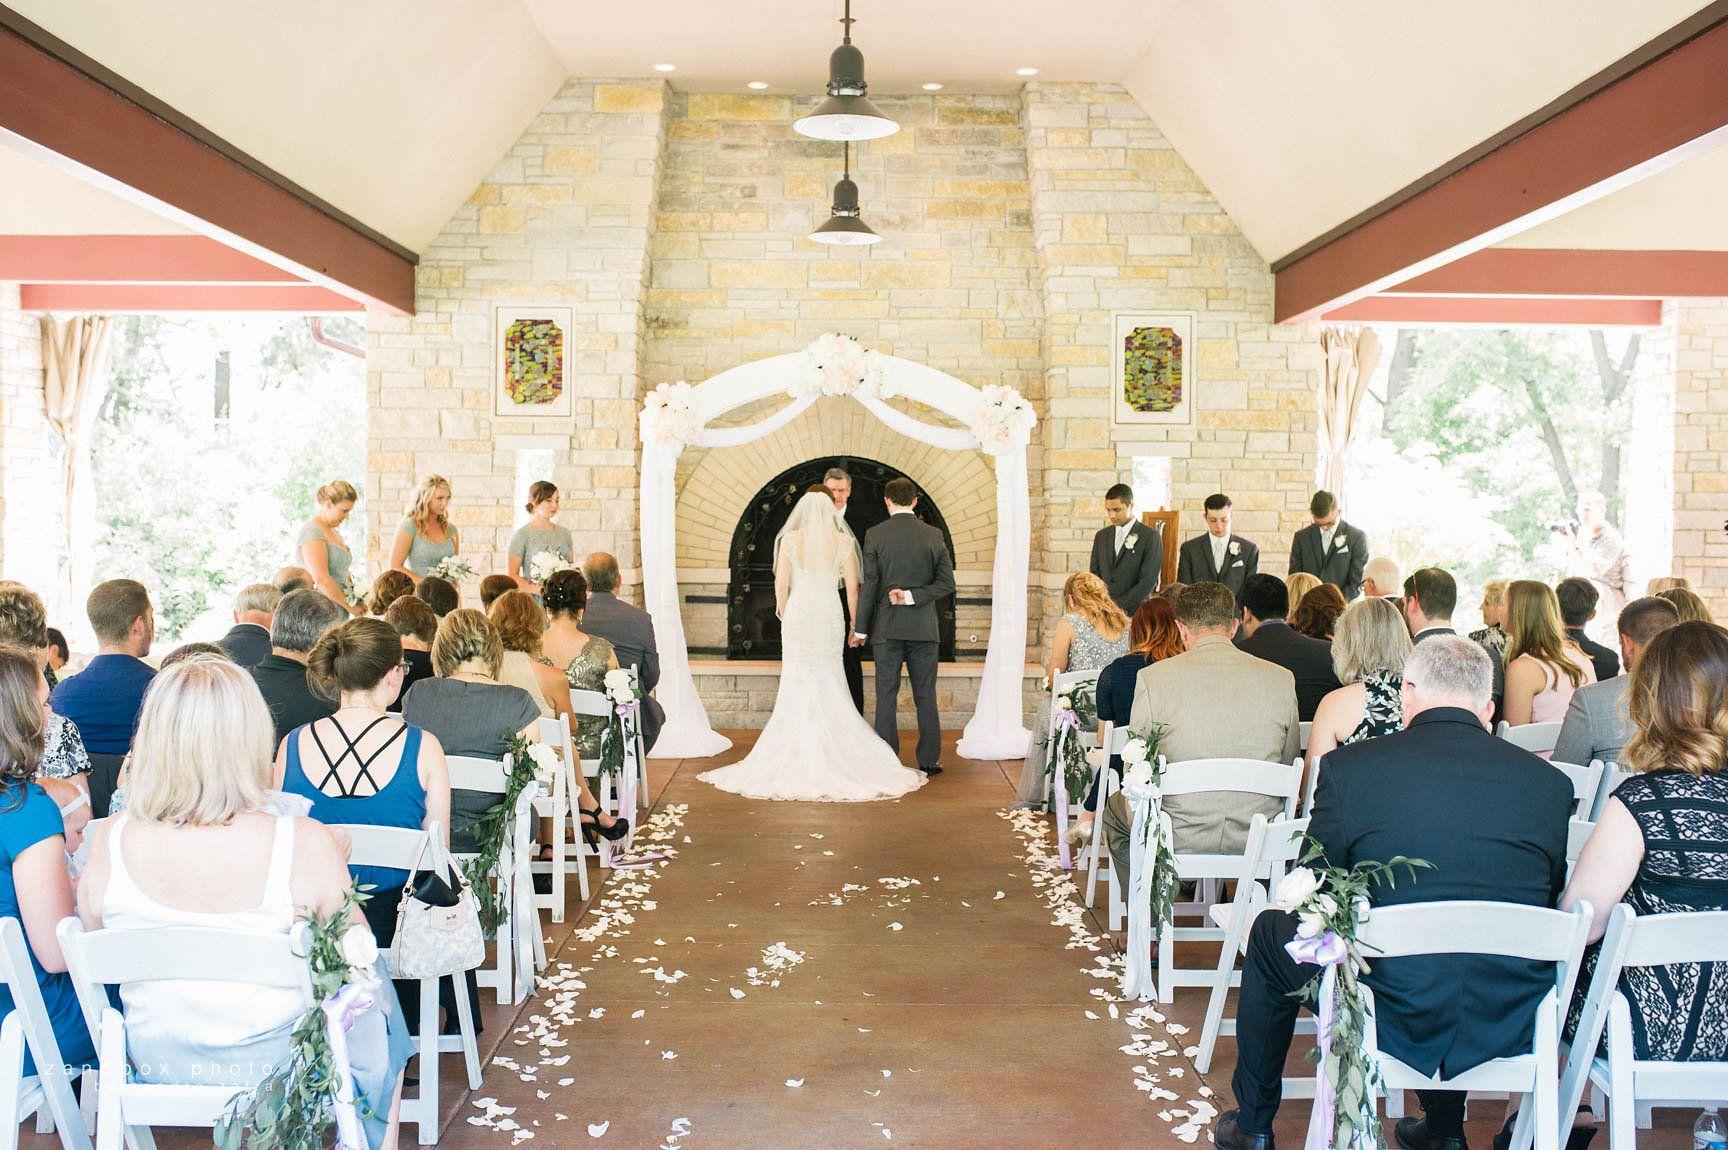 Pavilion ceremony Wedding prices, Estate wedding, Venues